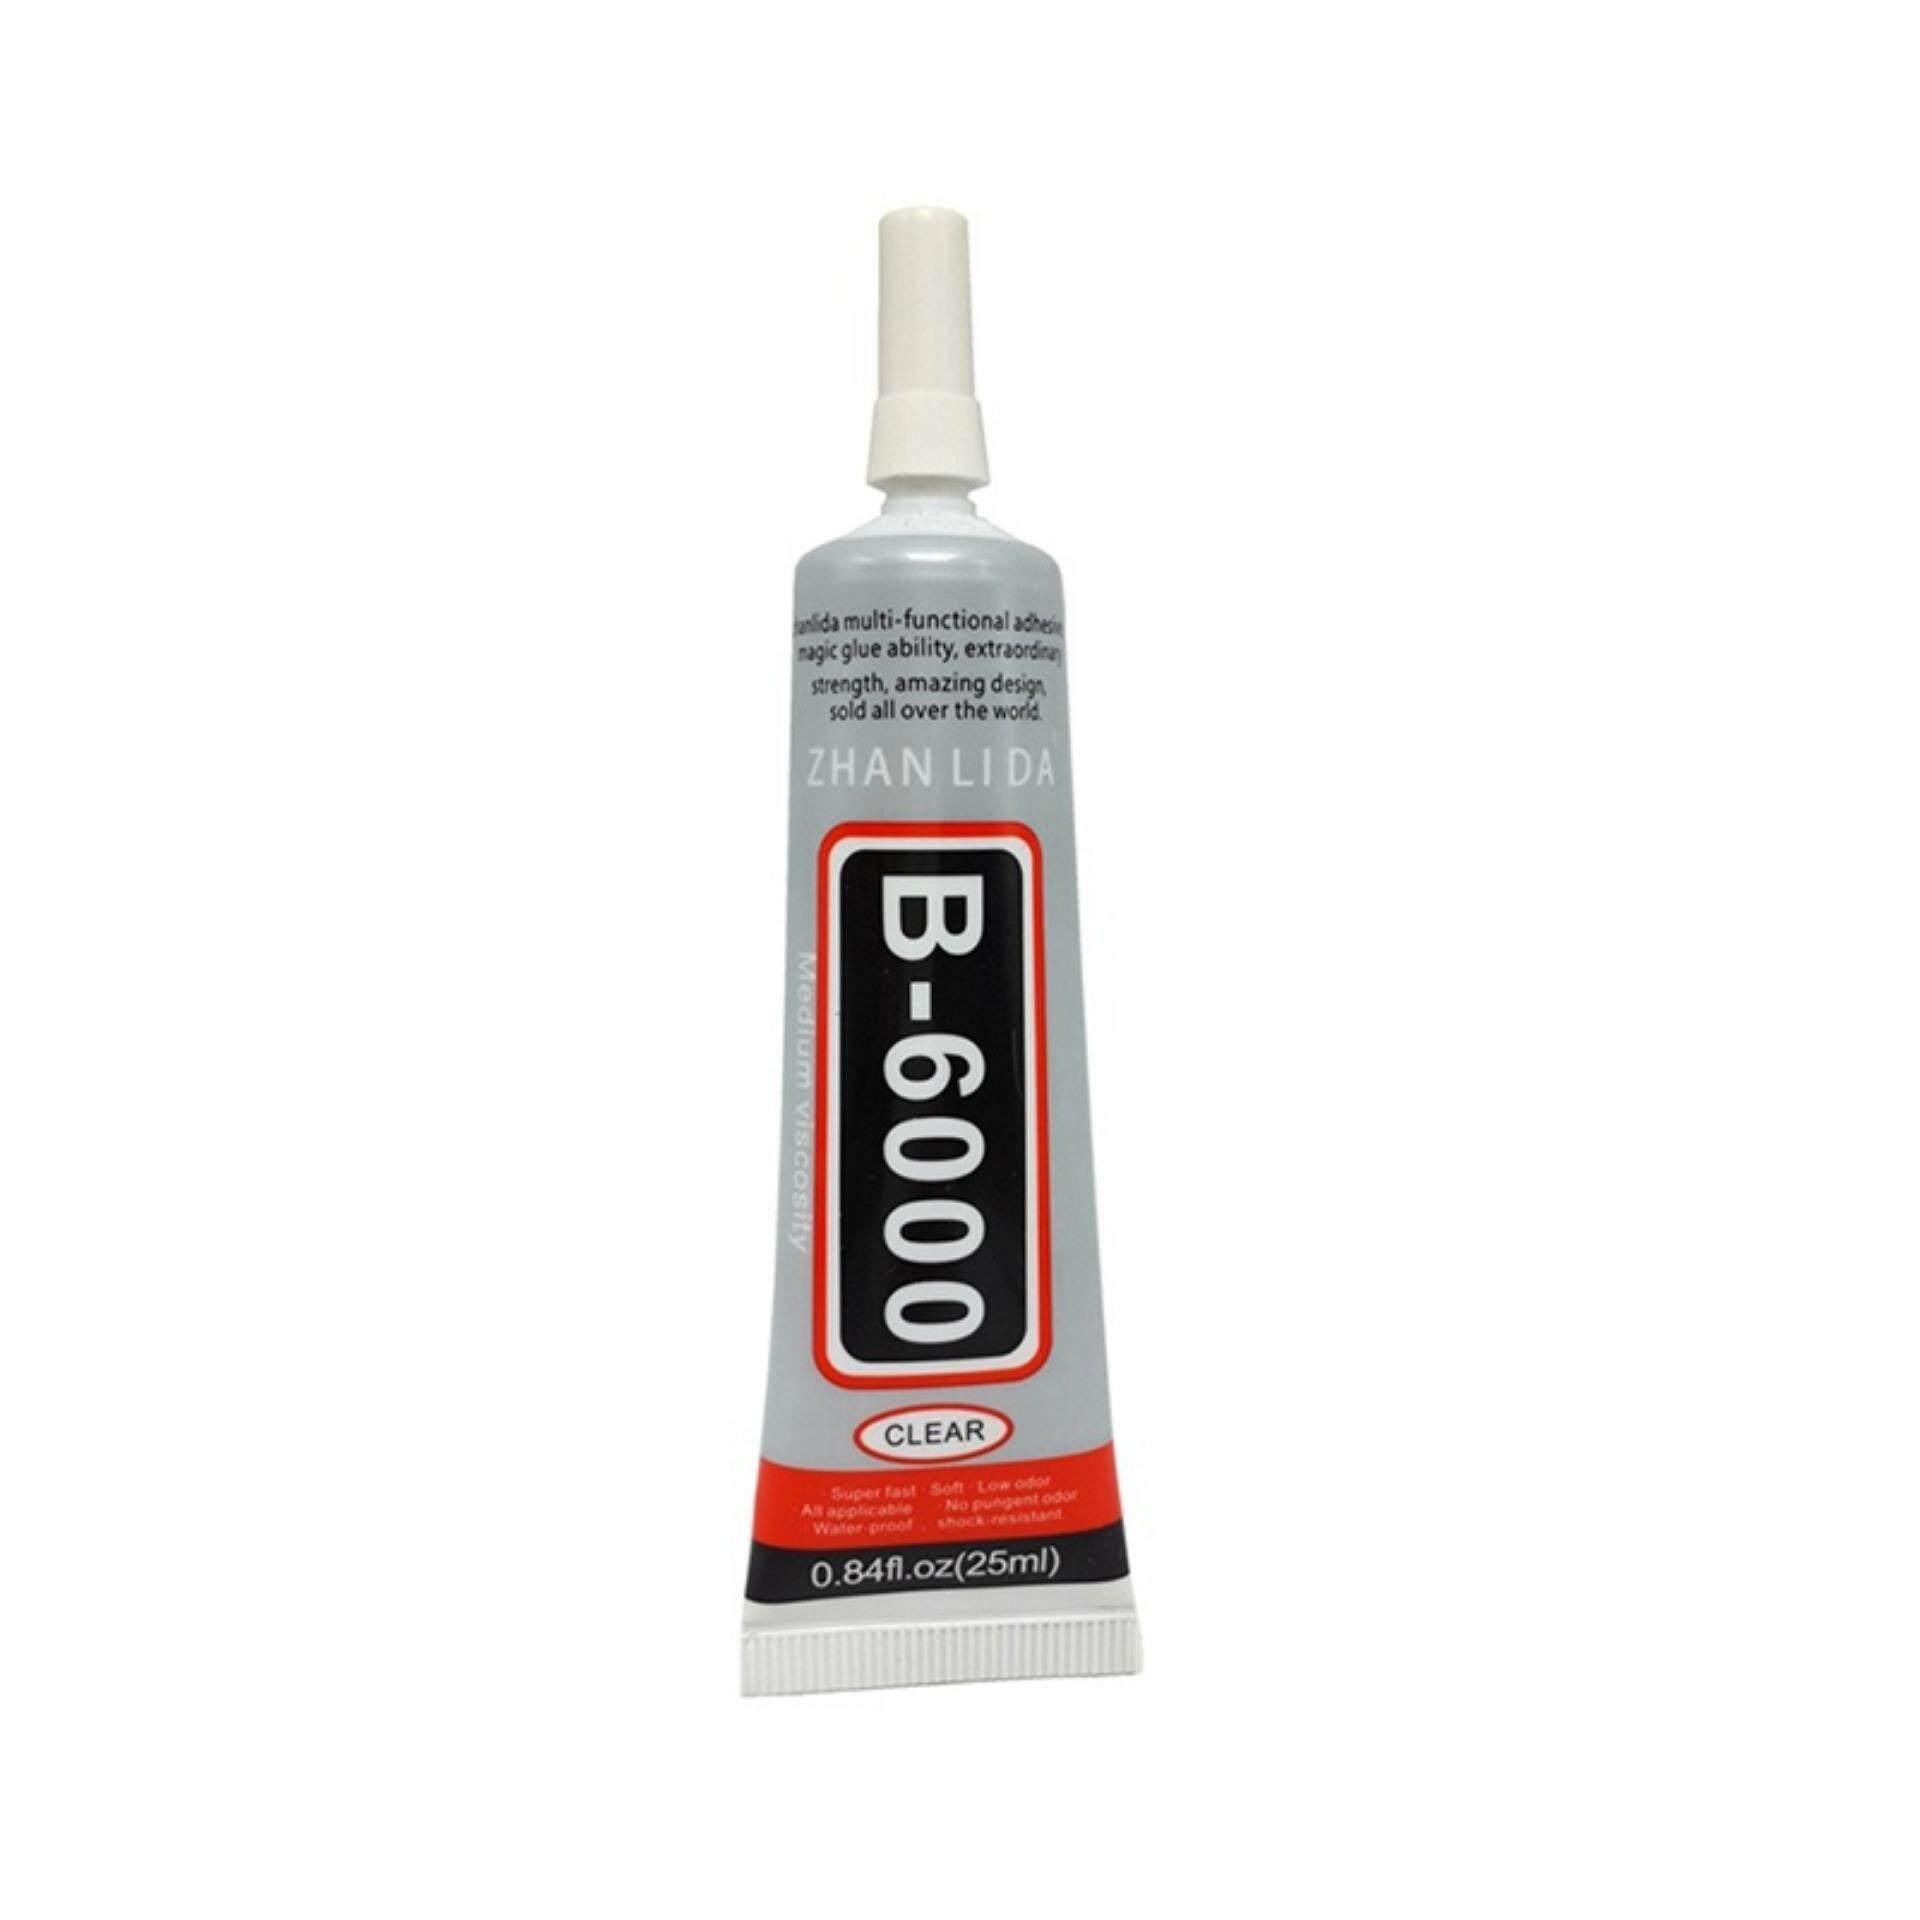 Mua E6000 Waterproof Industrial Strength Glue Adhesive Jewelry Nails Glue Clear 25ml